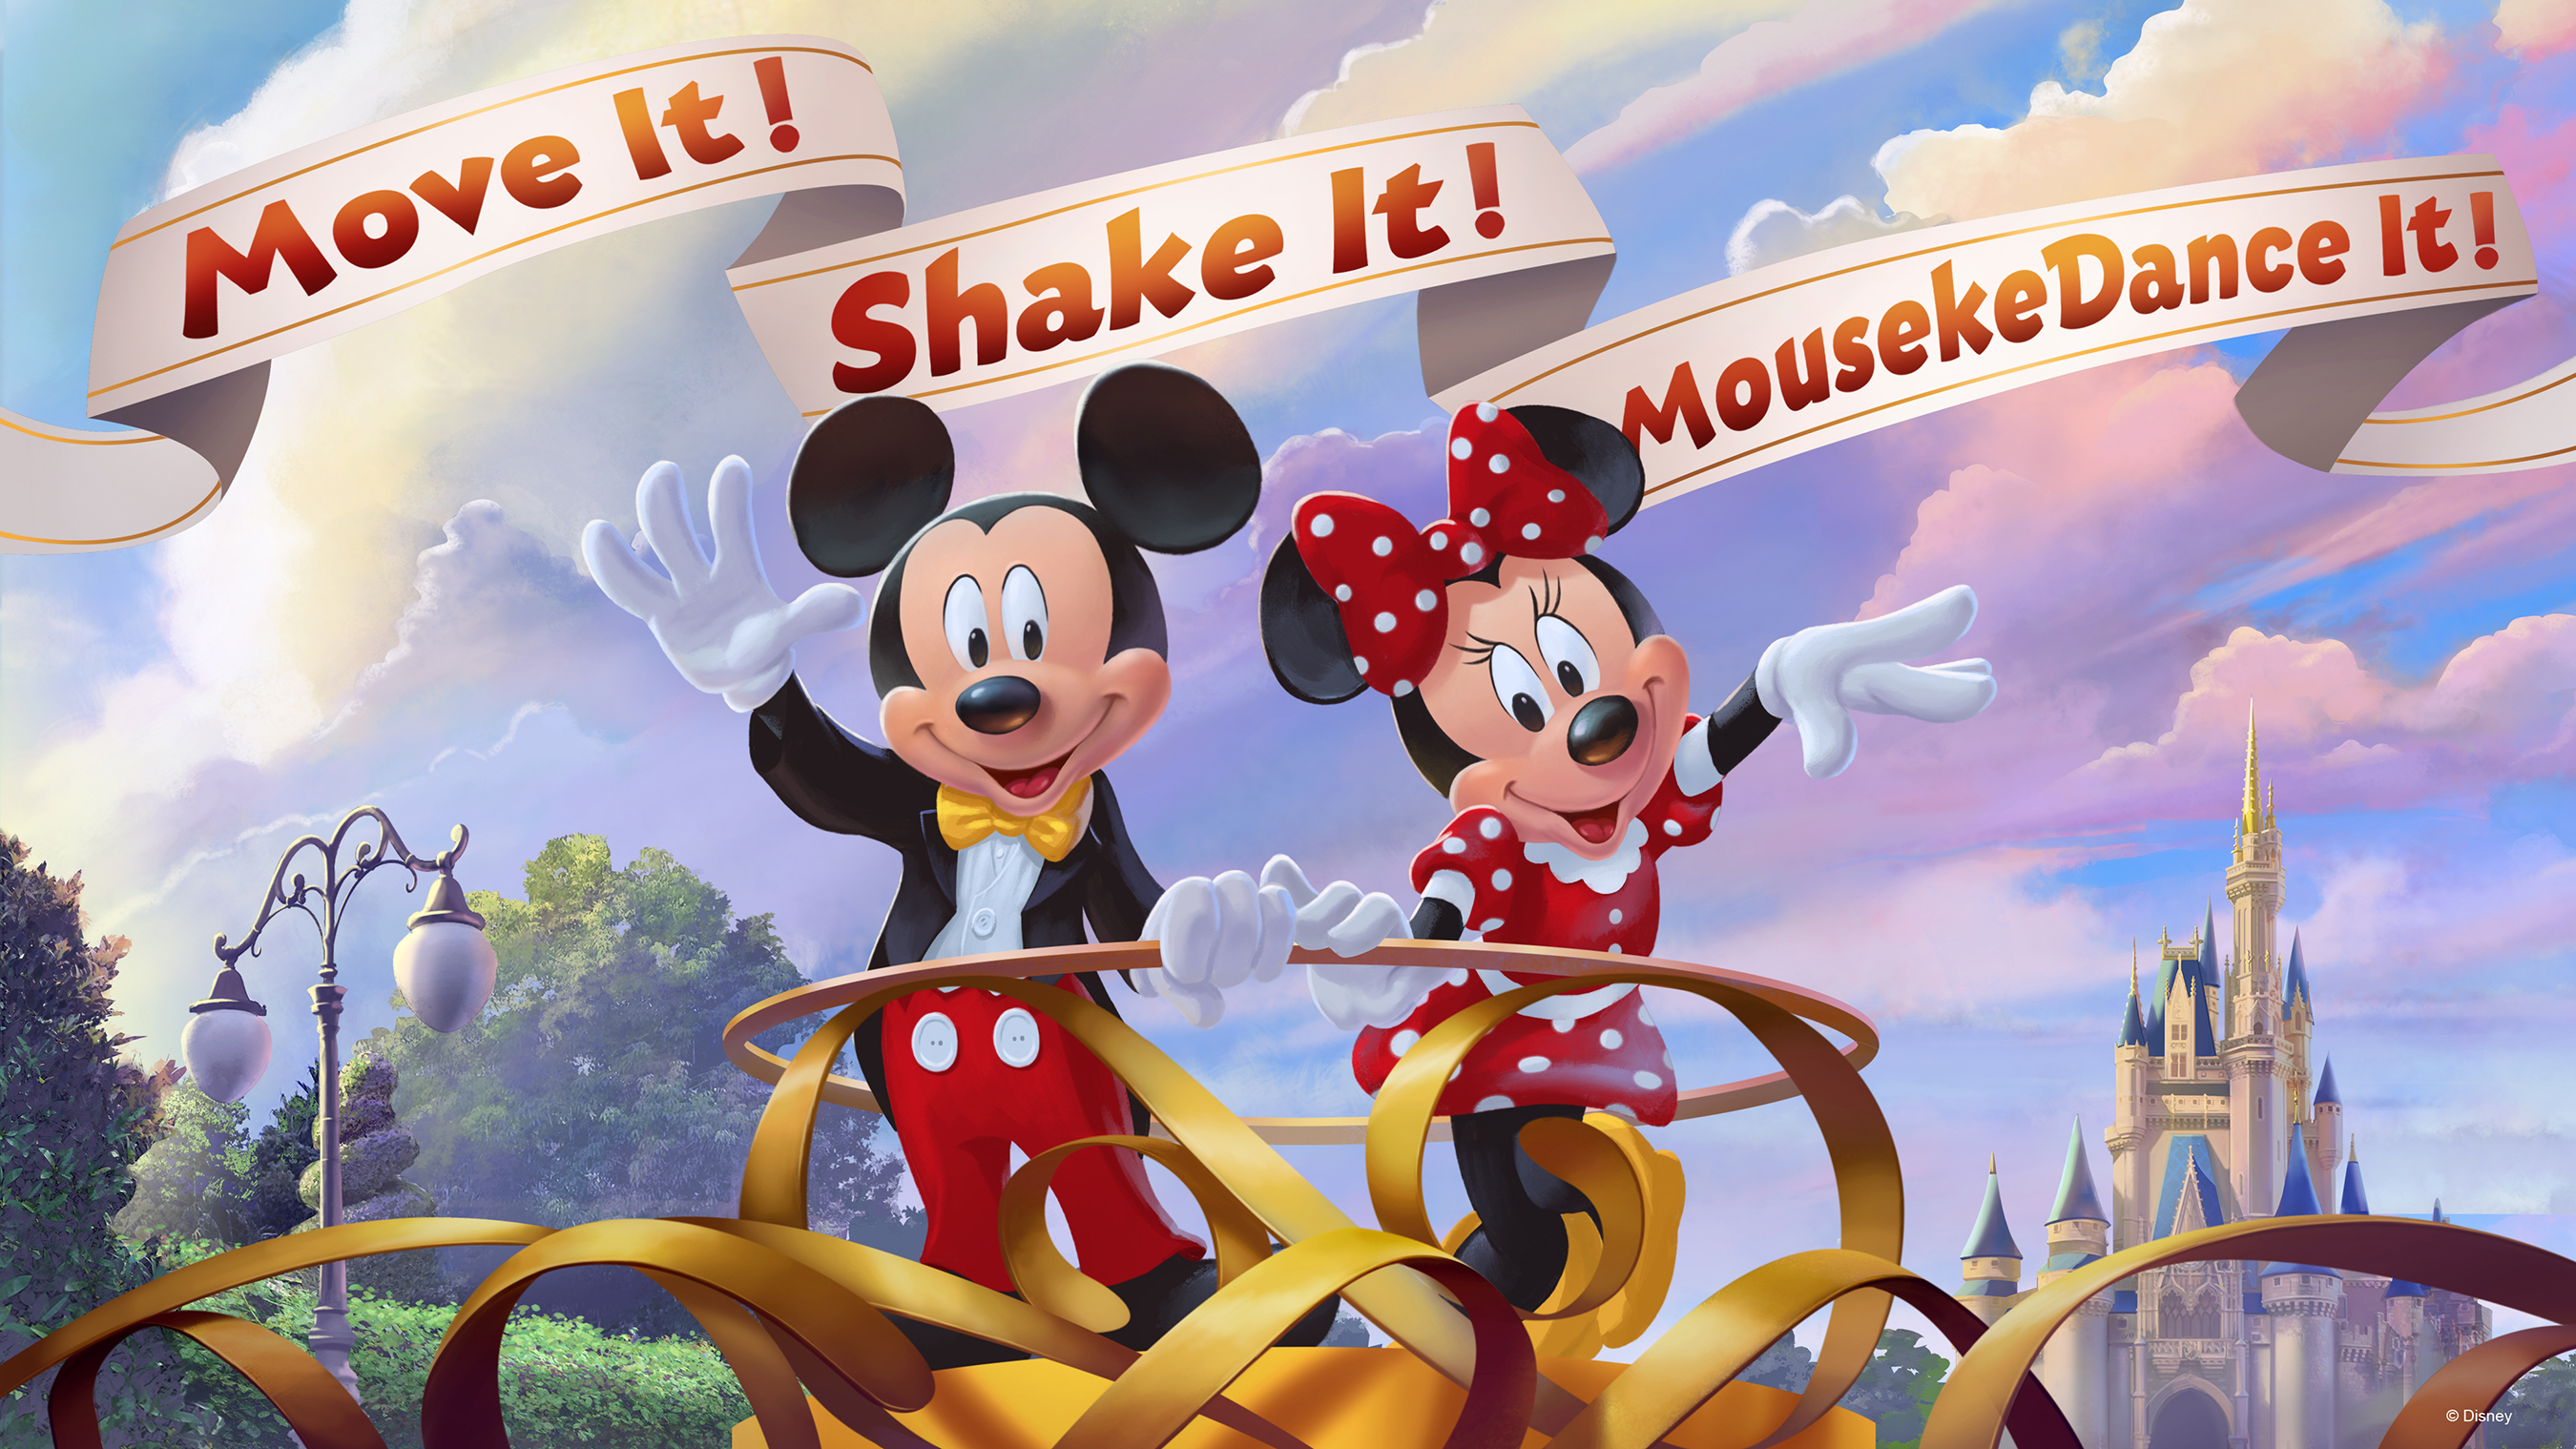 What's coming to Walt Disney World Resort in 2019, Disney World 2019, New at Disney in 2019, #DisneySMMC